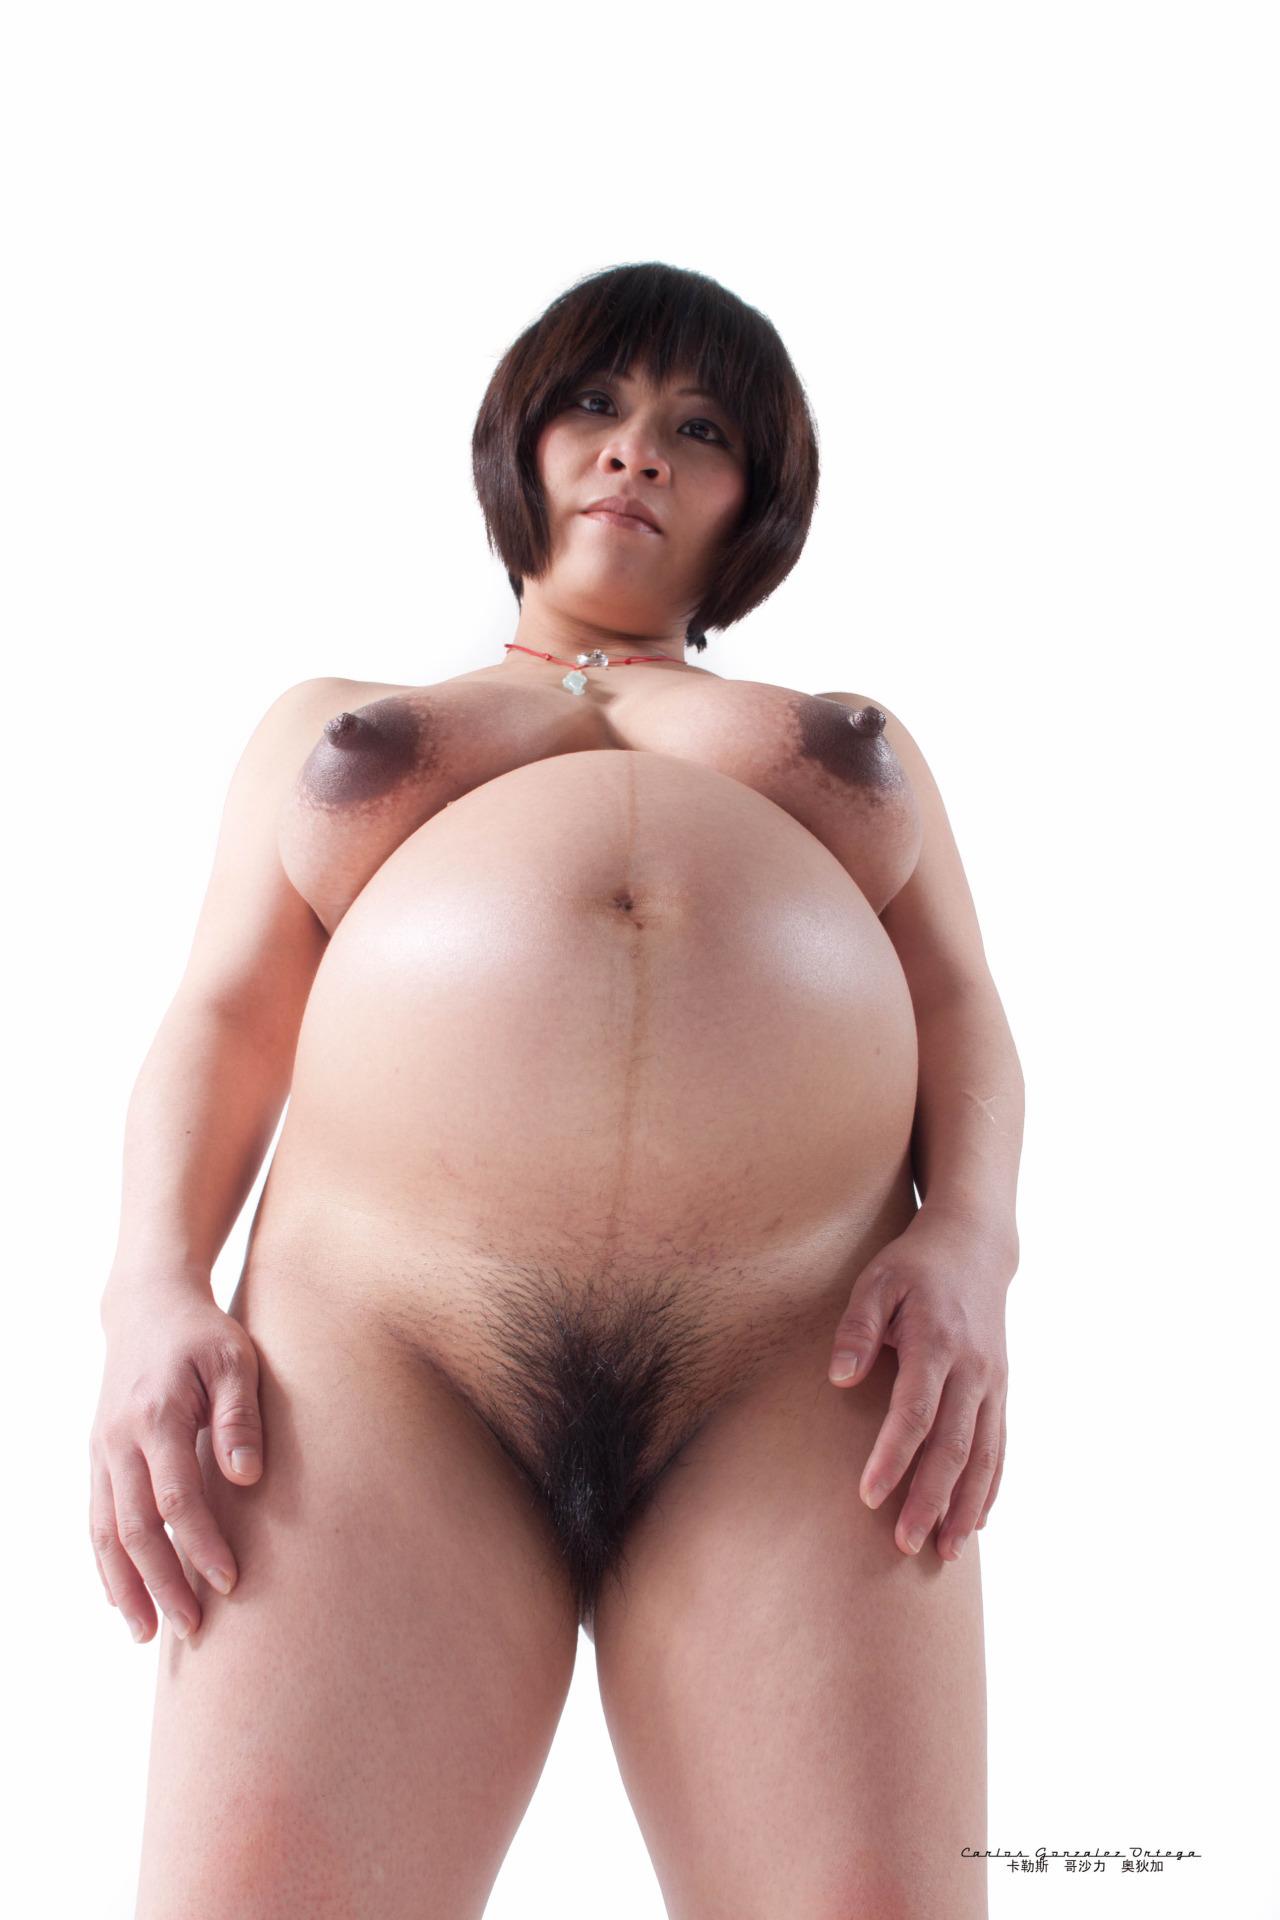 Lactating pregnant nude tumblr